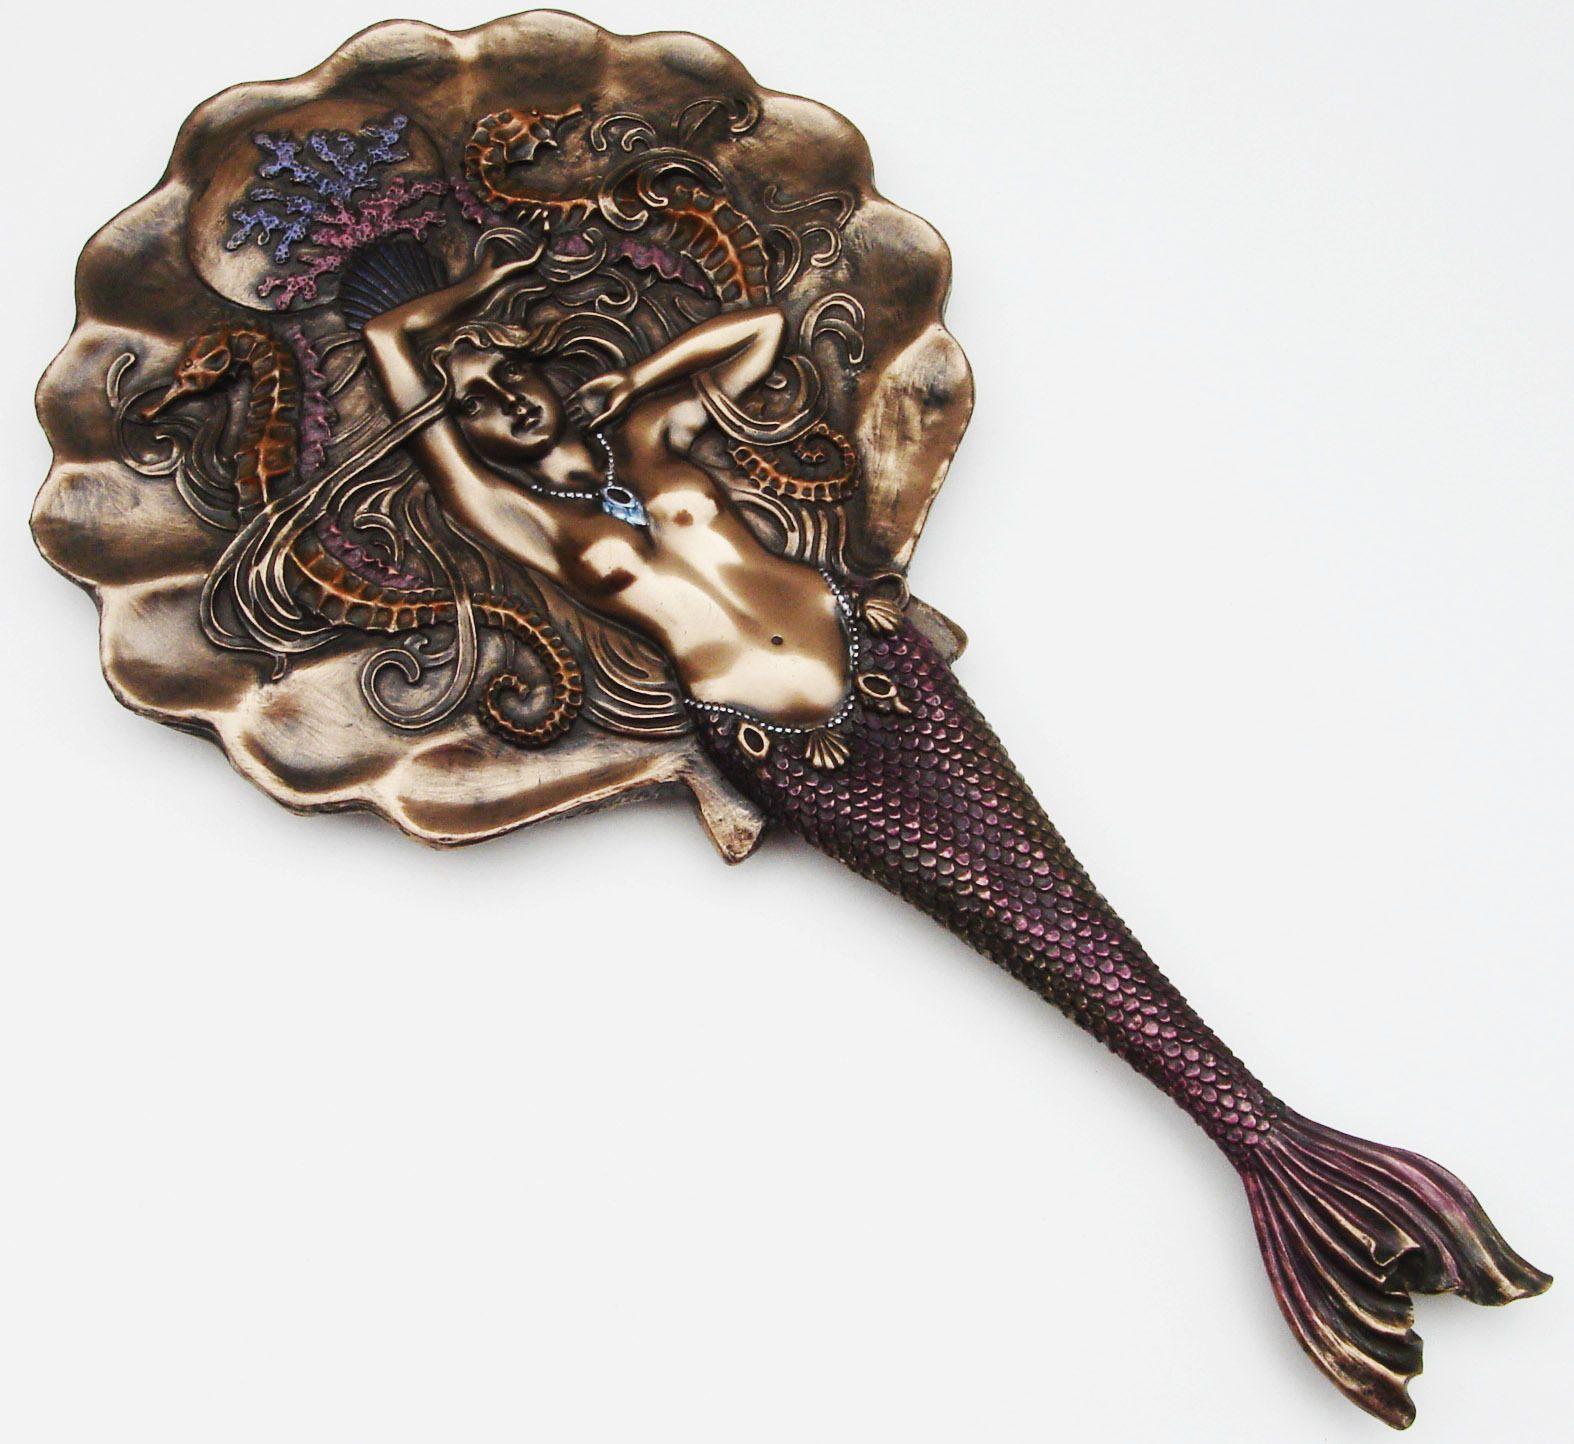 New Vintage Antique Mermaid Hand Mirror Nautical Decor